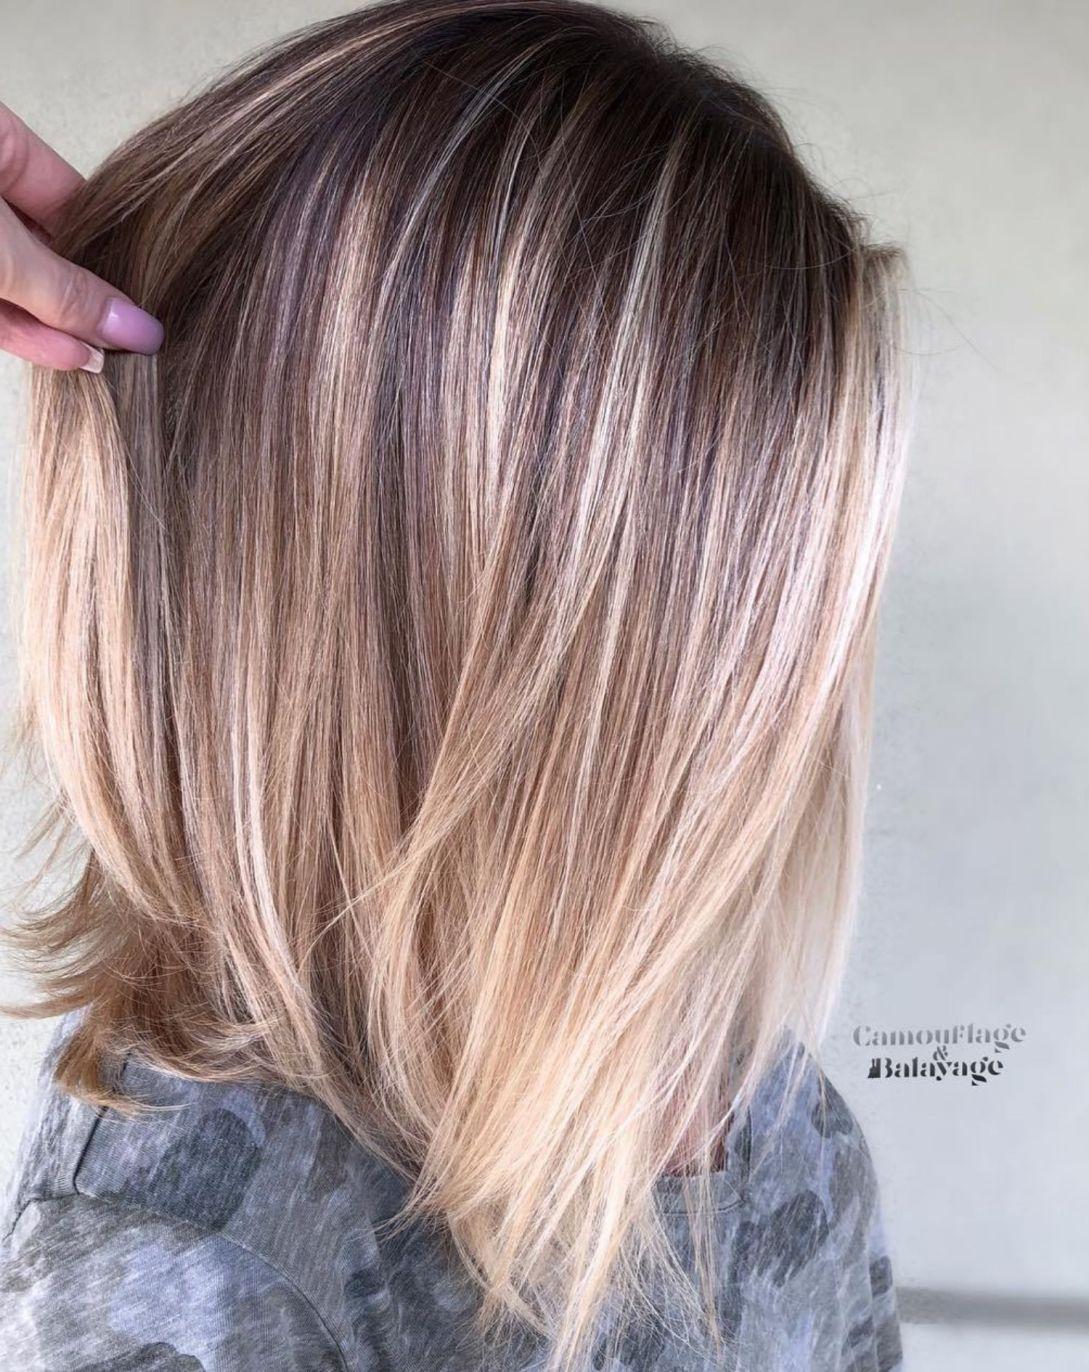 70 Devastatingly Cool Haircuts for Thin Hair